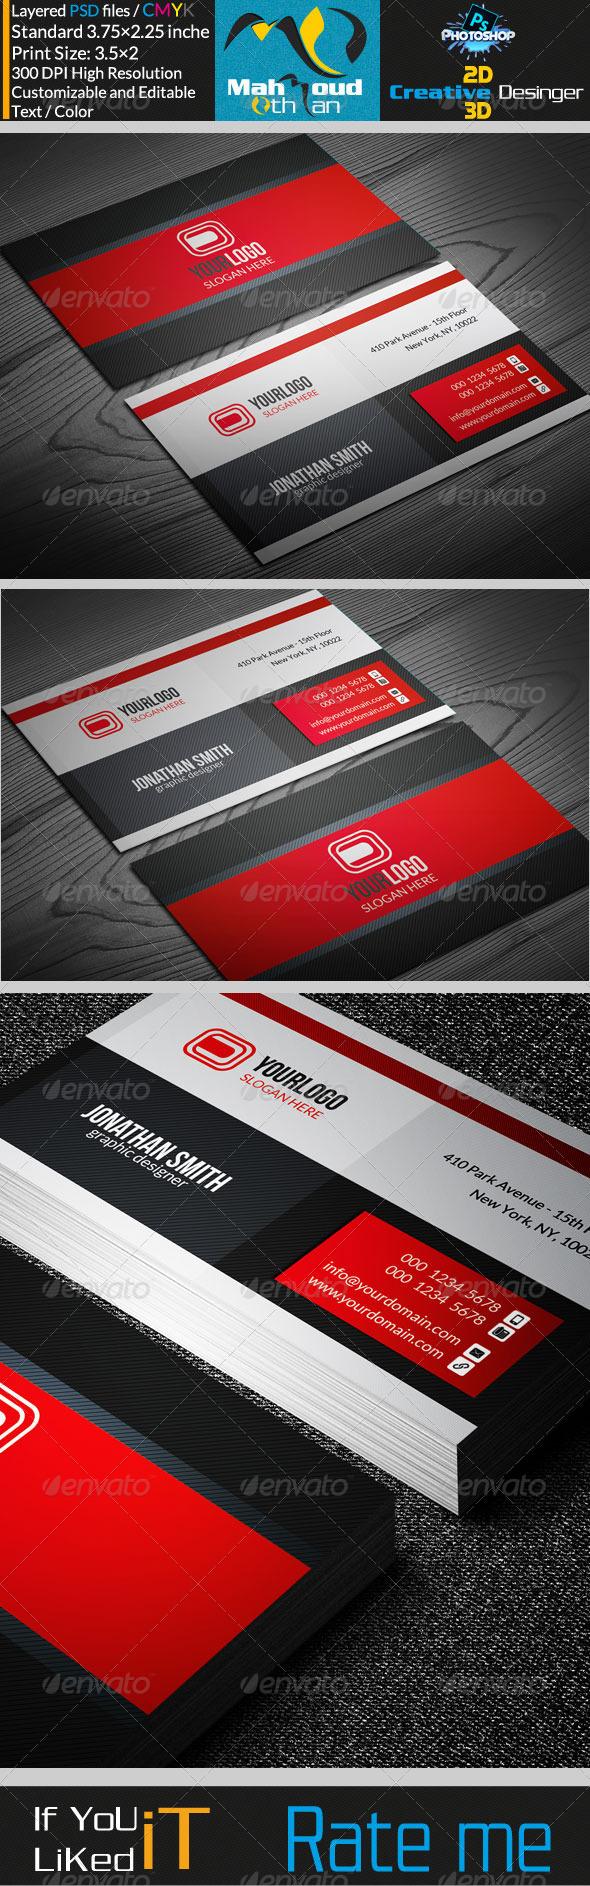 GraphicRiver Corportae Business Card V17 7297888